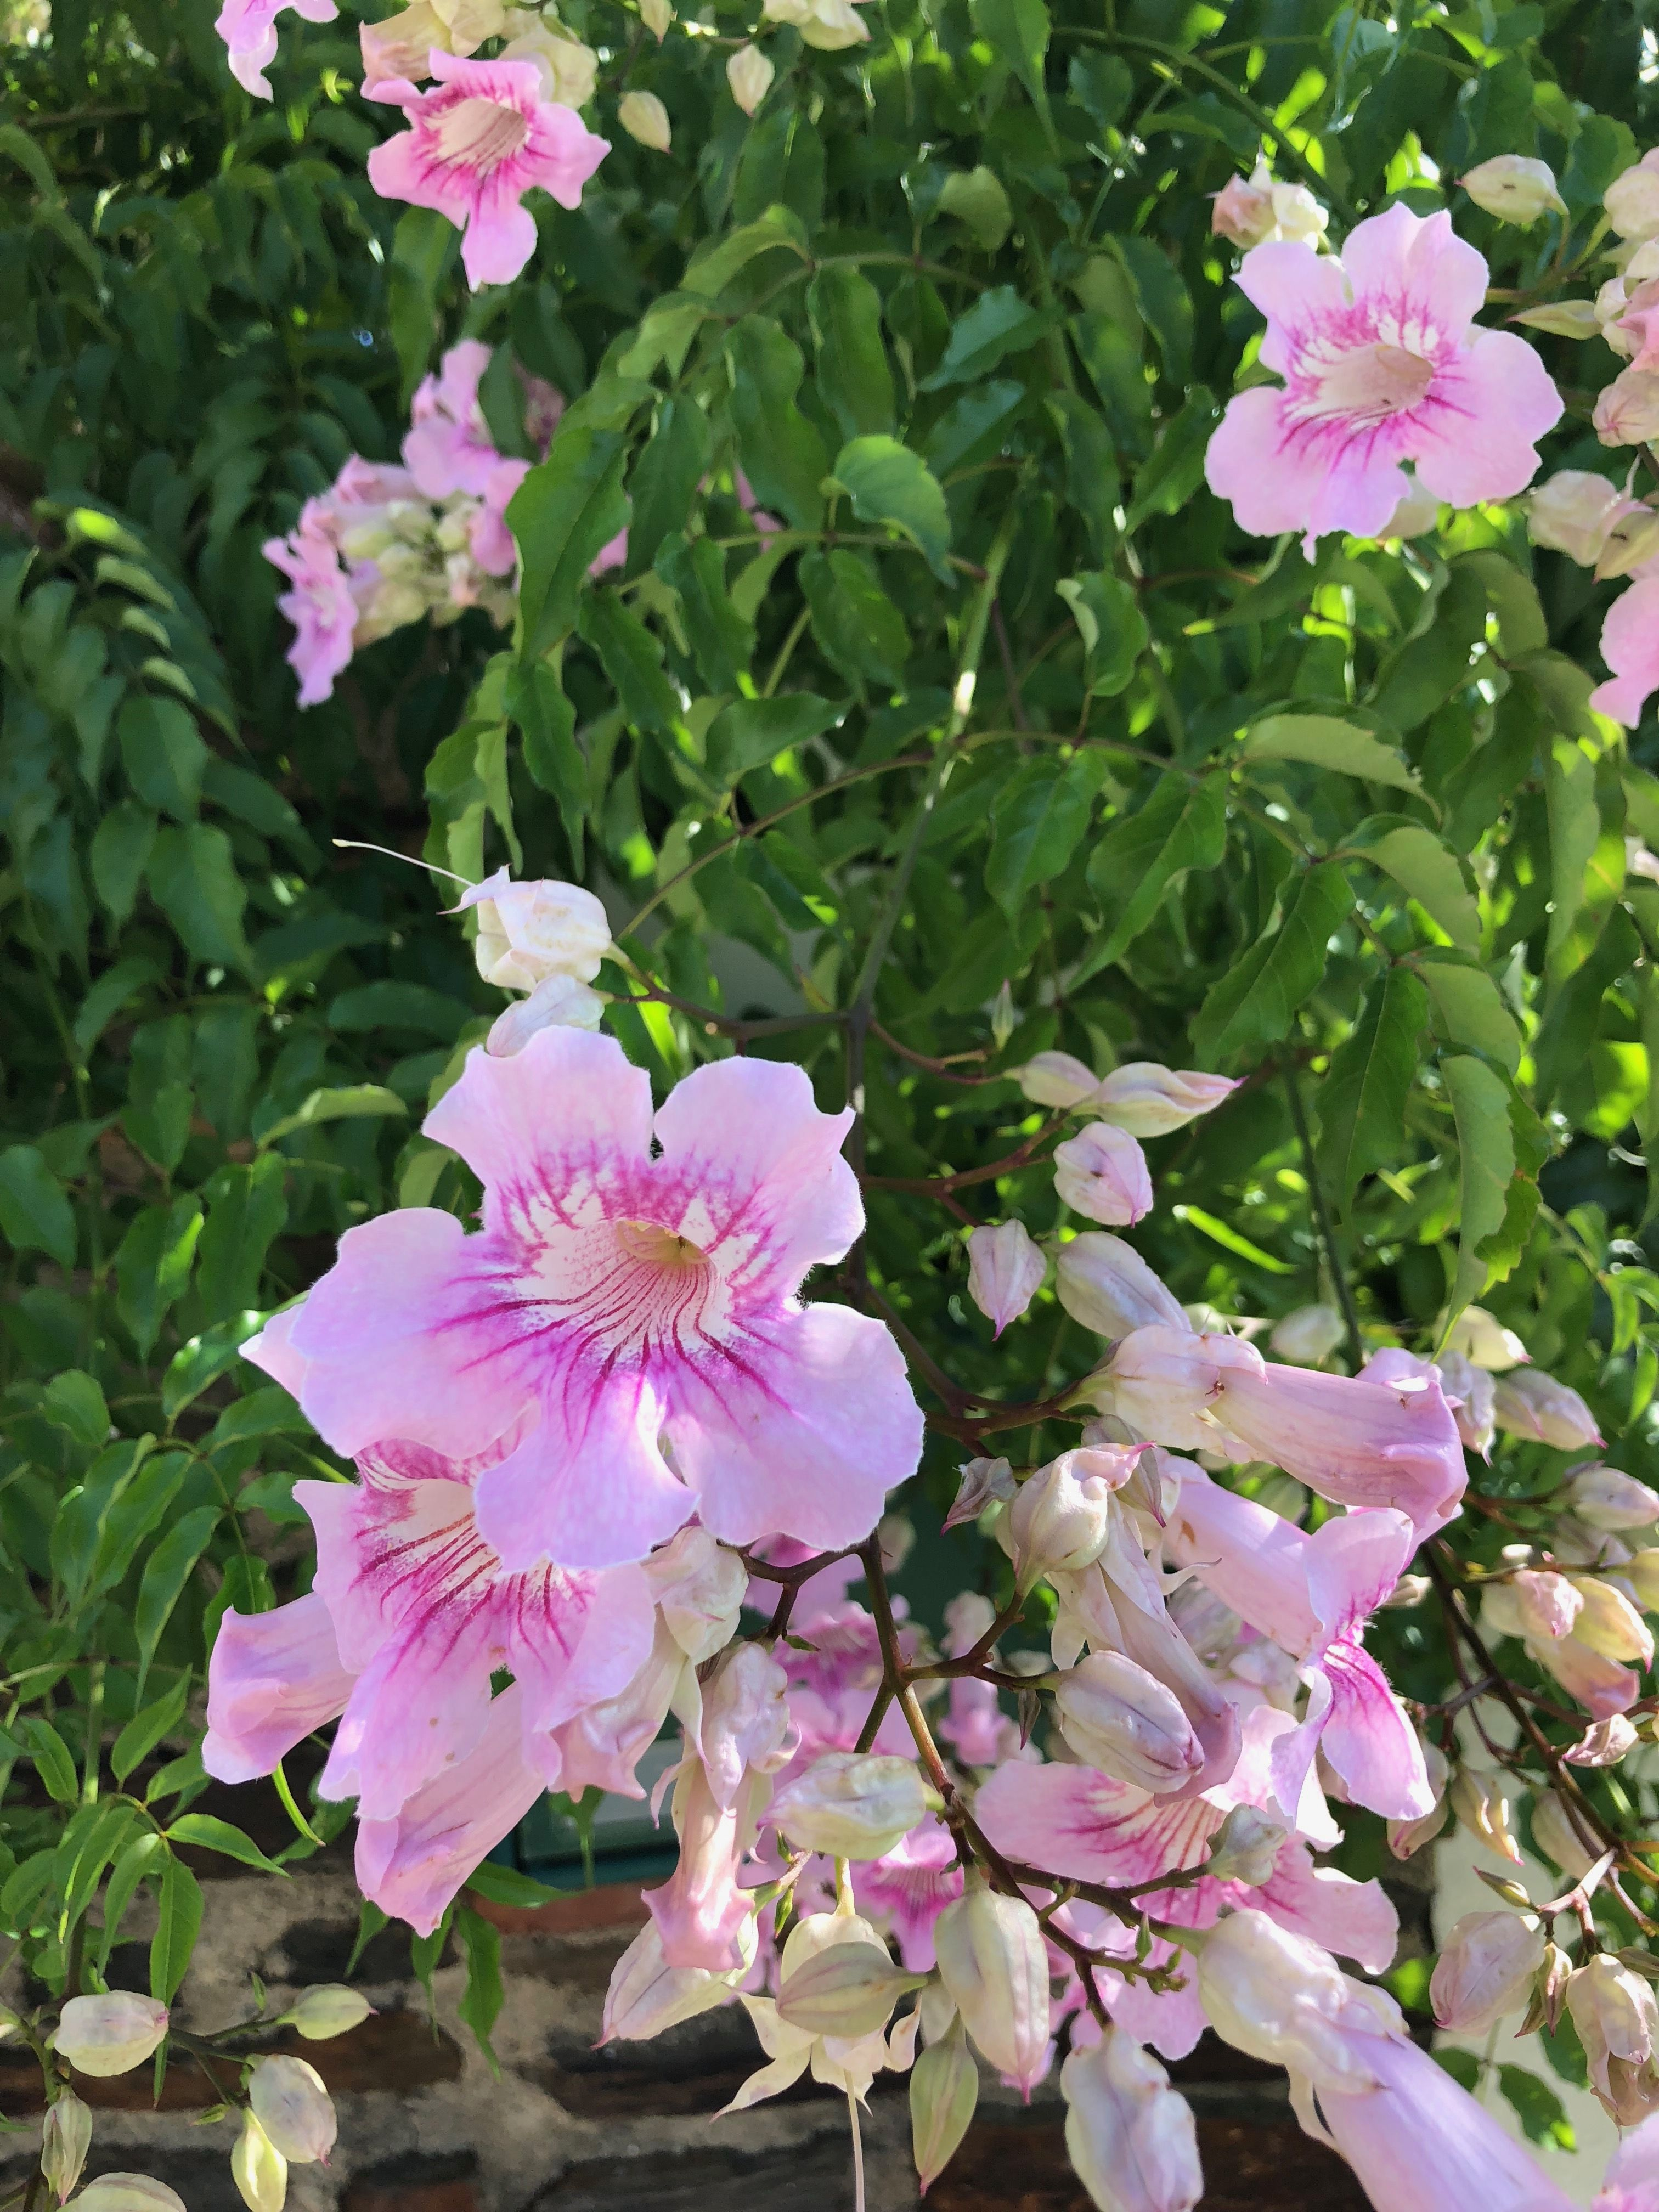 Pin by Heather Noon on Gardening Plants, Garden